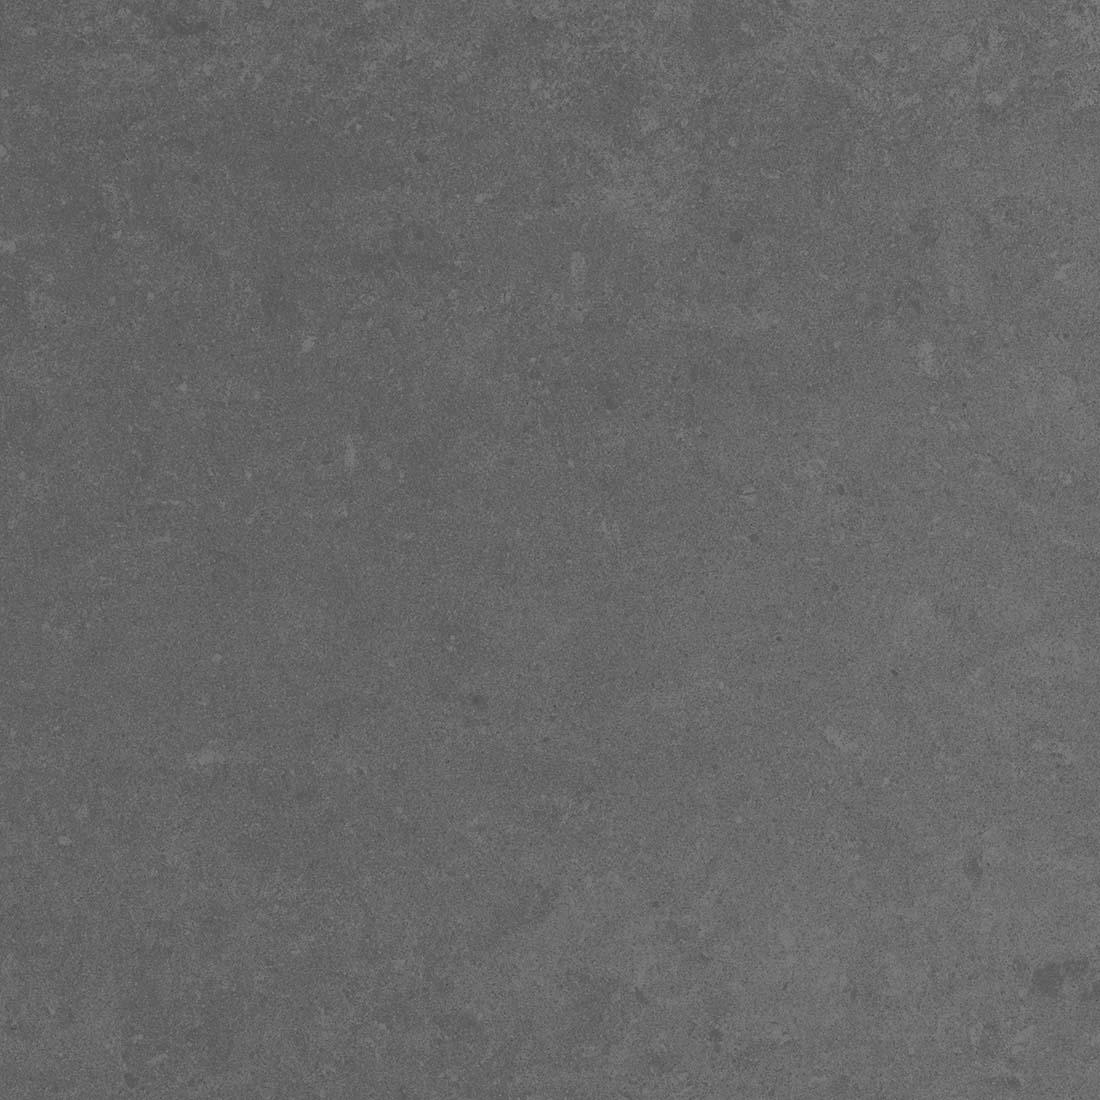 Jumeirah 60x60 Dark Grey Polished 1